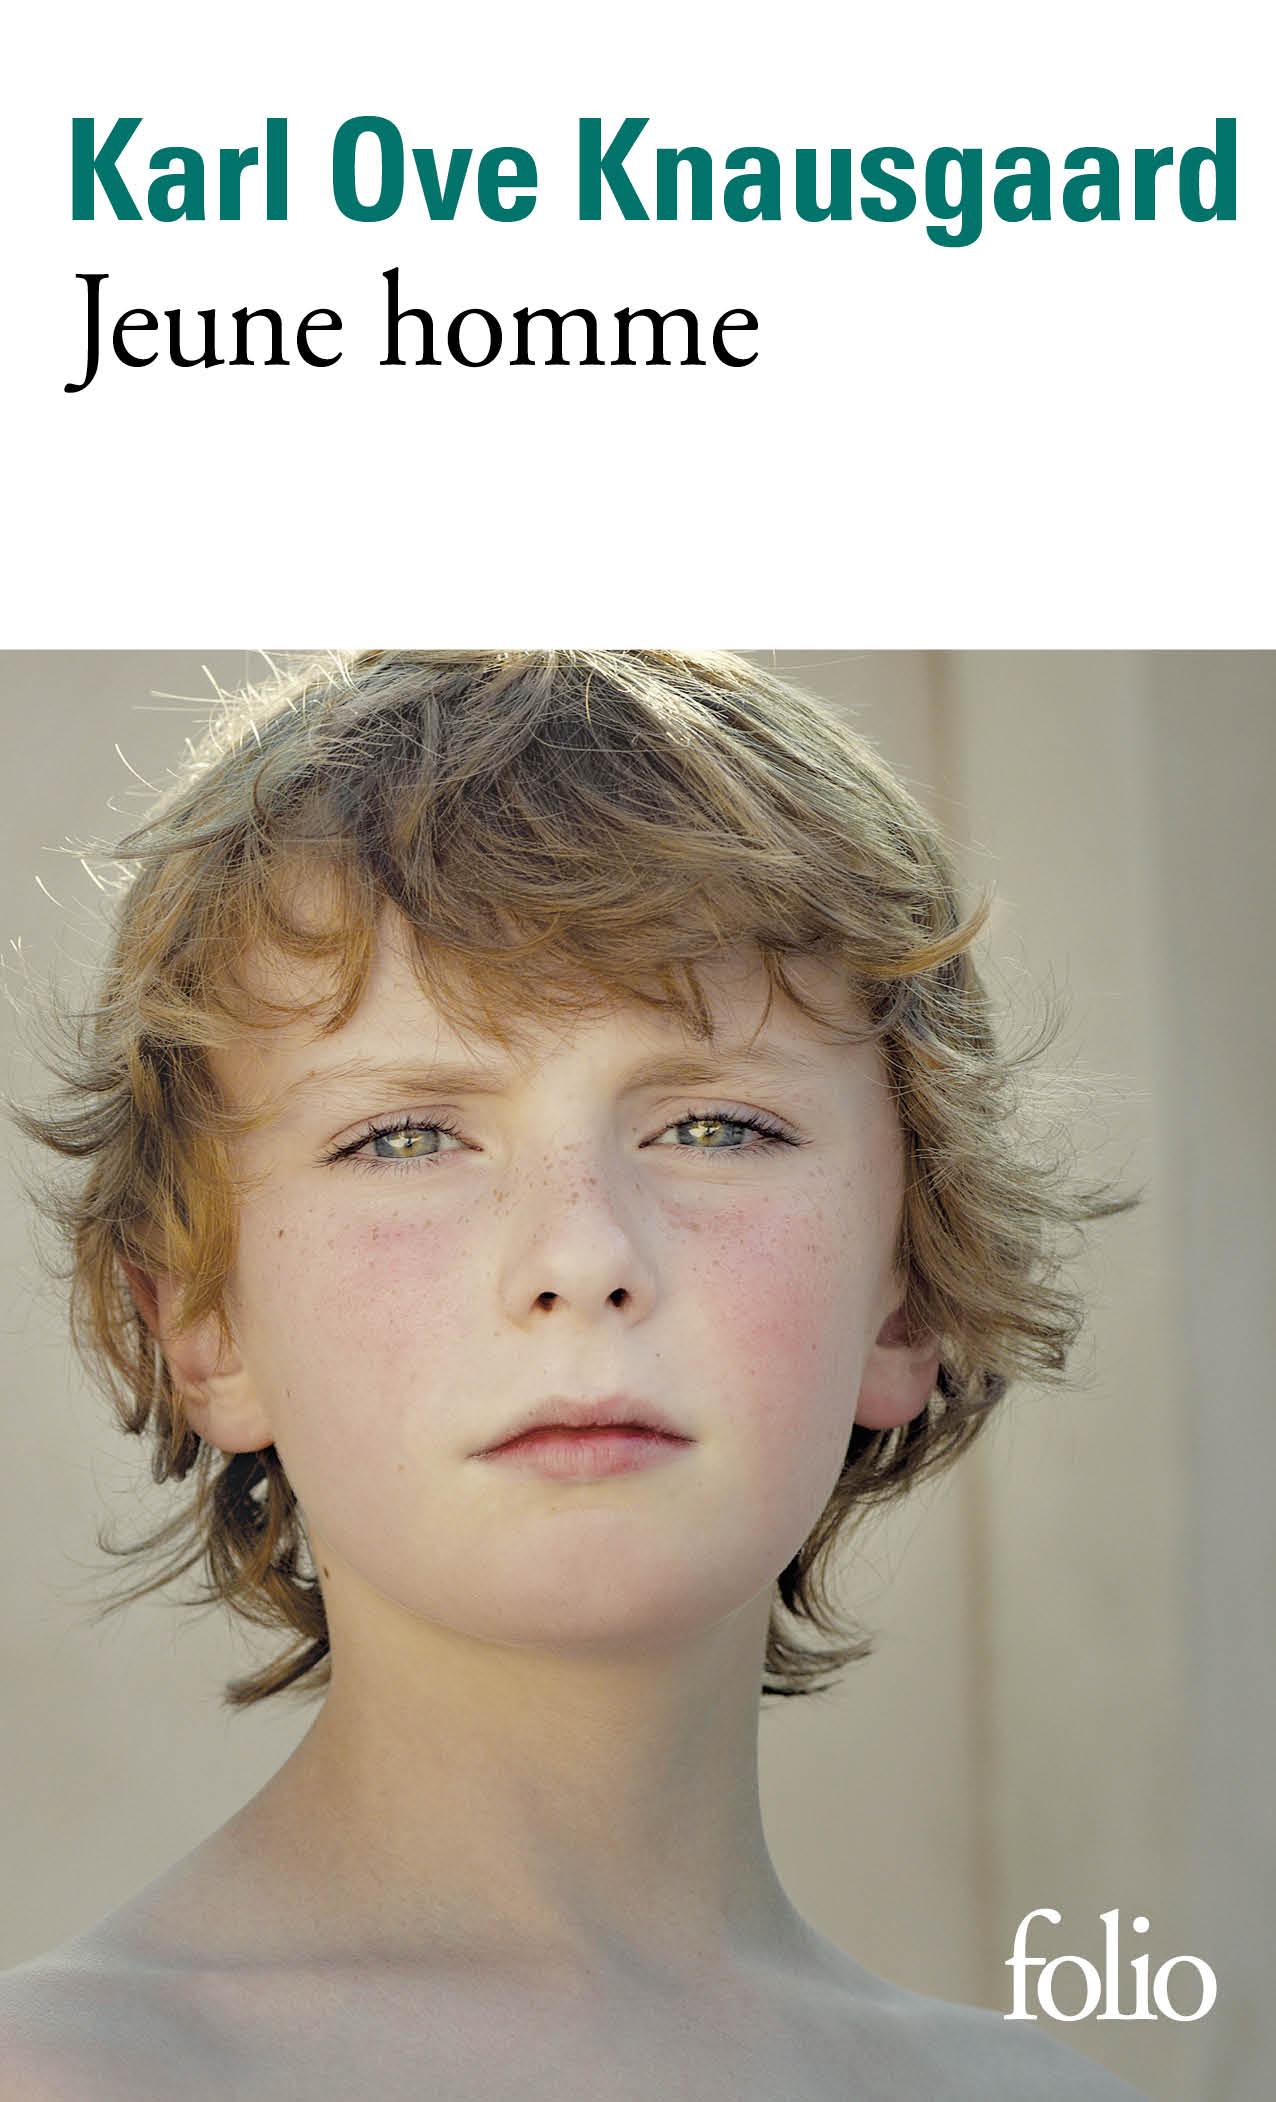 Mon combat (Tome 3) - Jeune homme